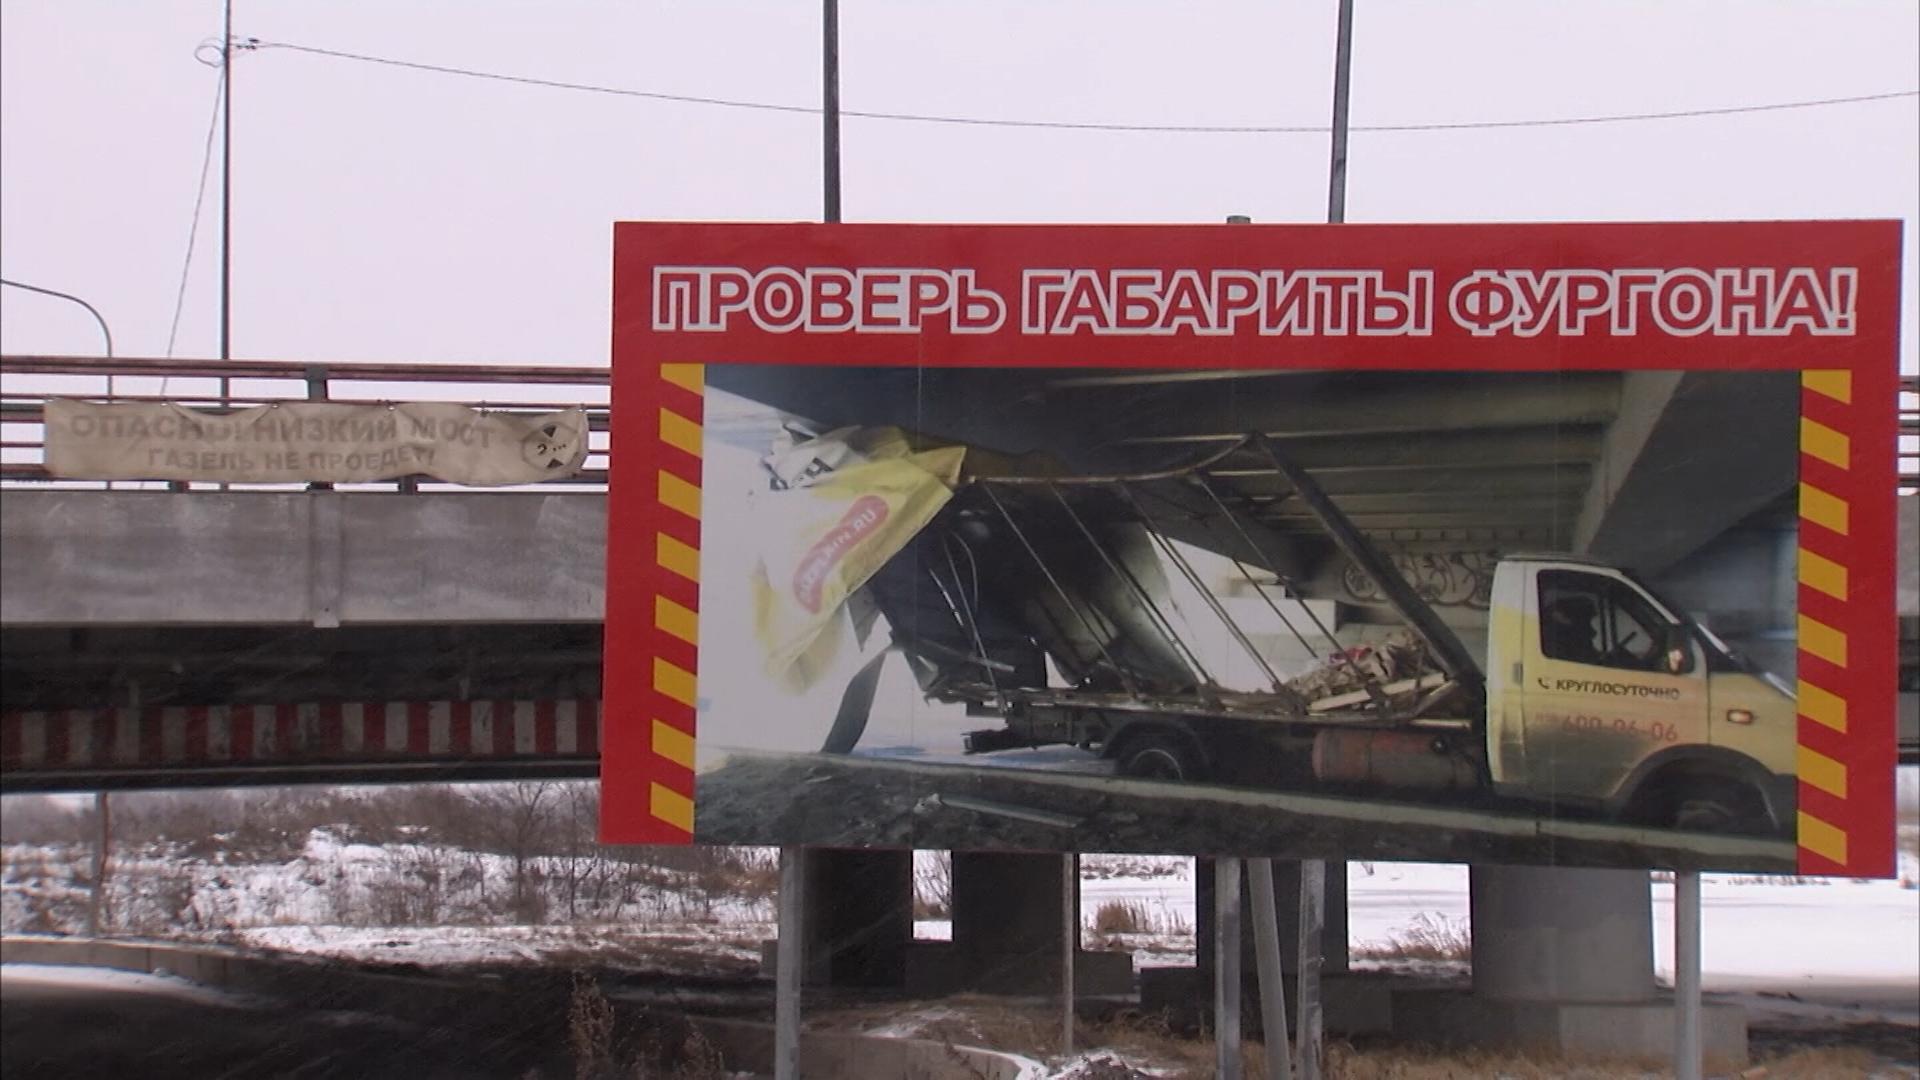 """Мост Глупости"" в Санкт-Петербурге"